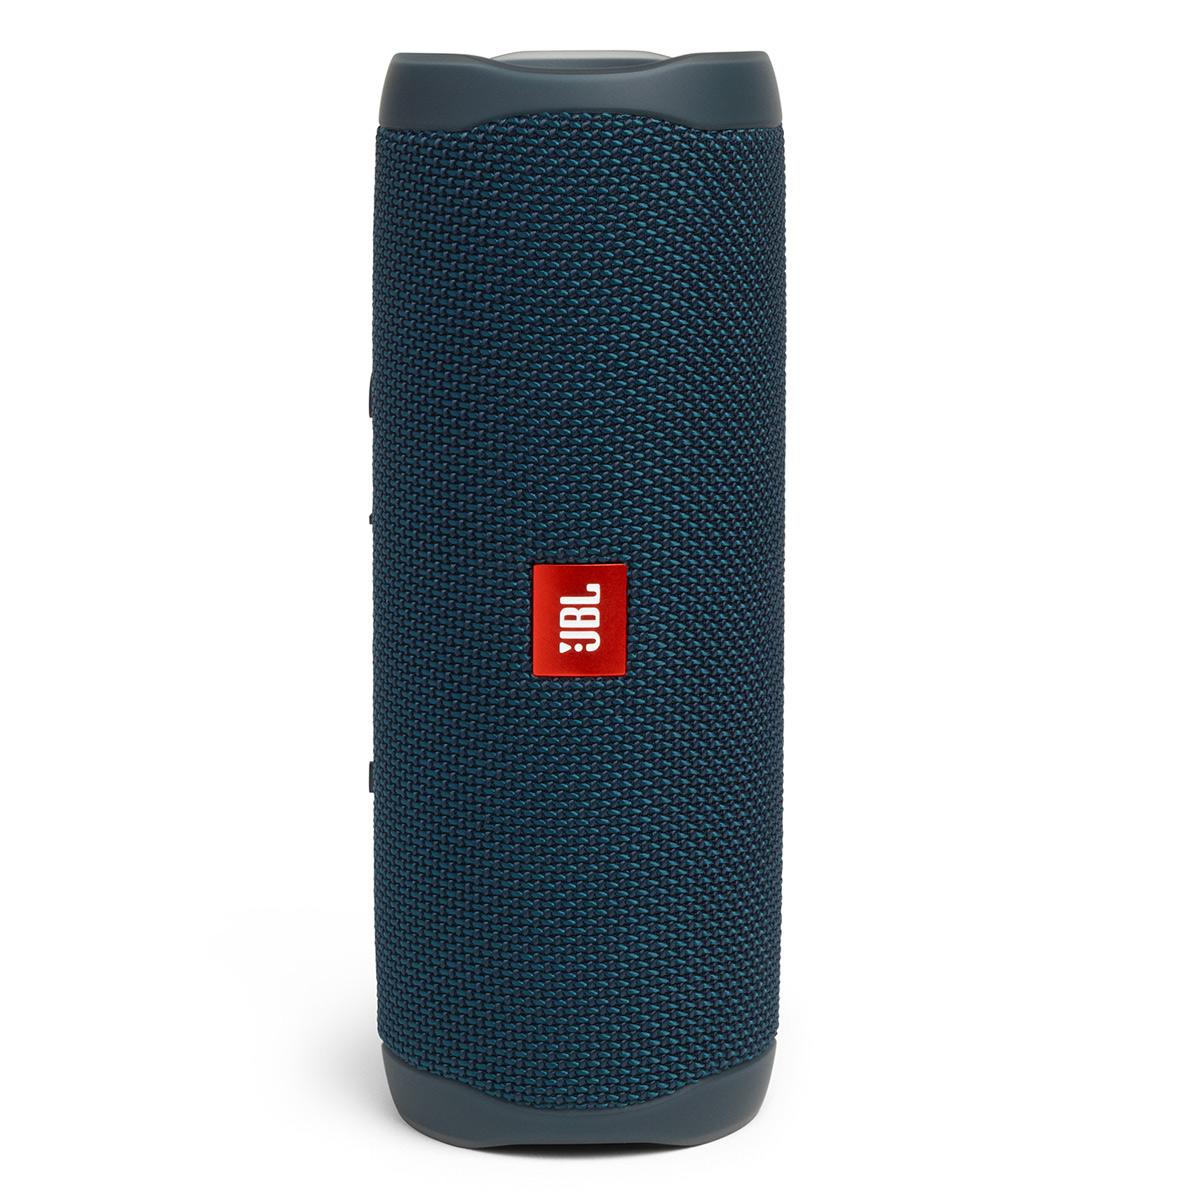 JBL-Flip-5-Portable-Waterproof-Bluetooth-Speaker thumbnail 9